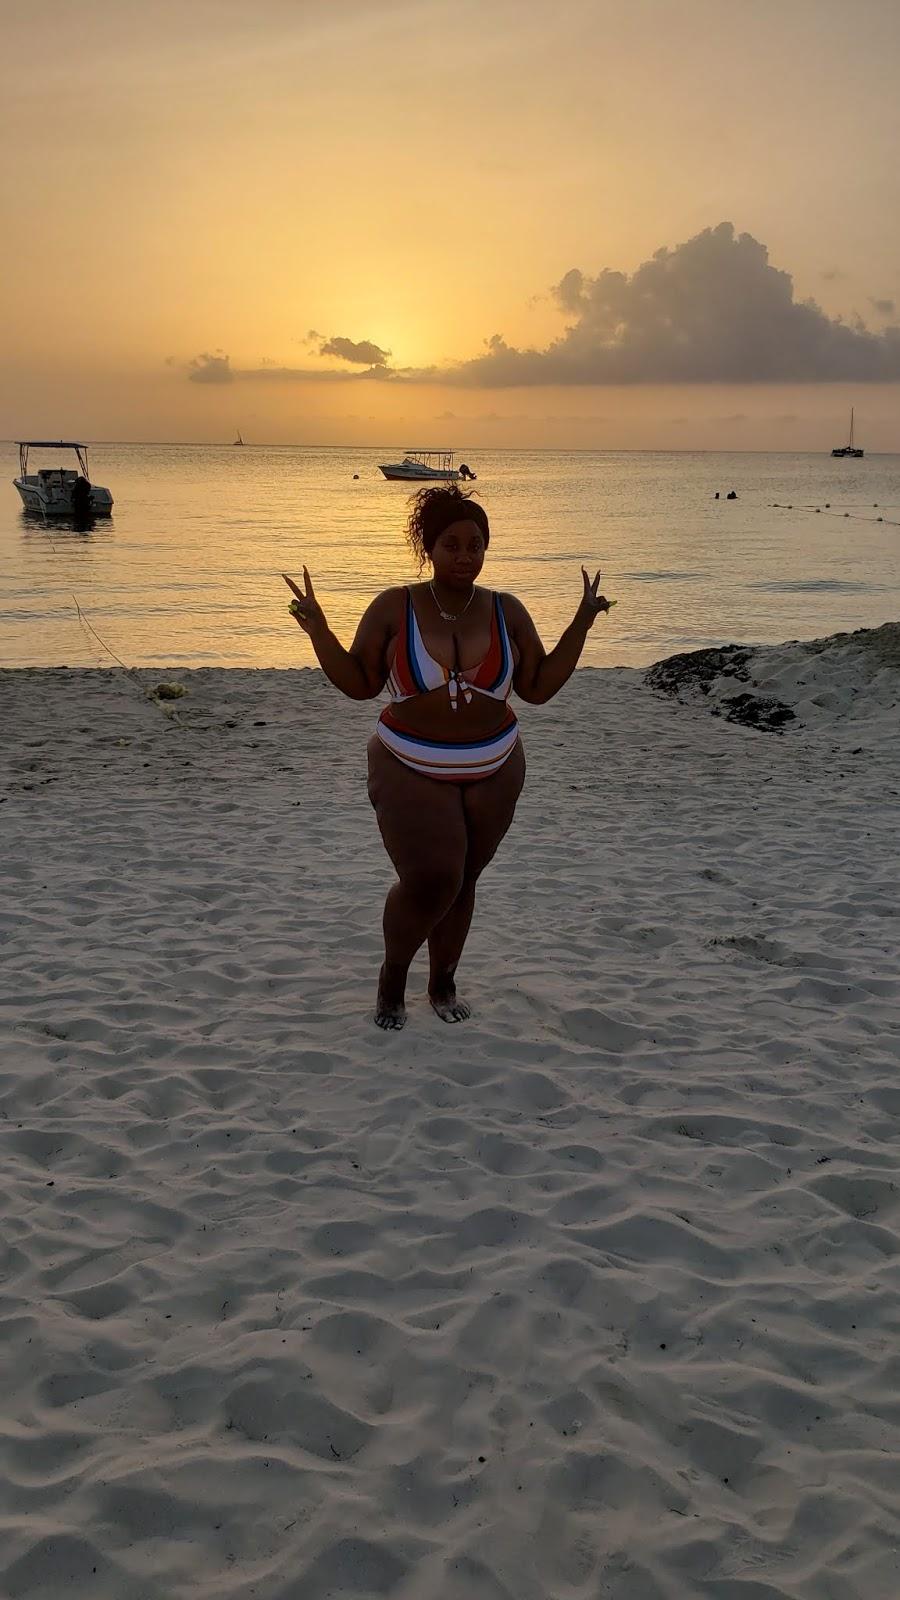 sunset at 7 mile beach negril jamaica